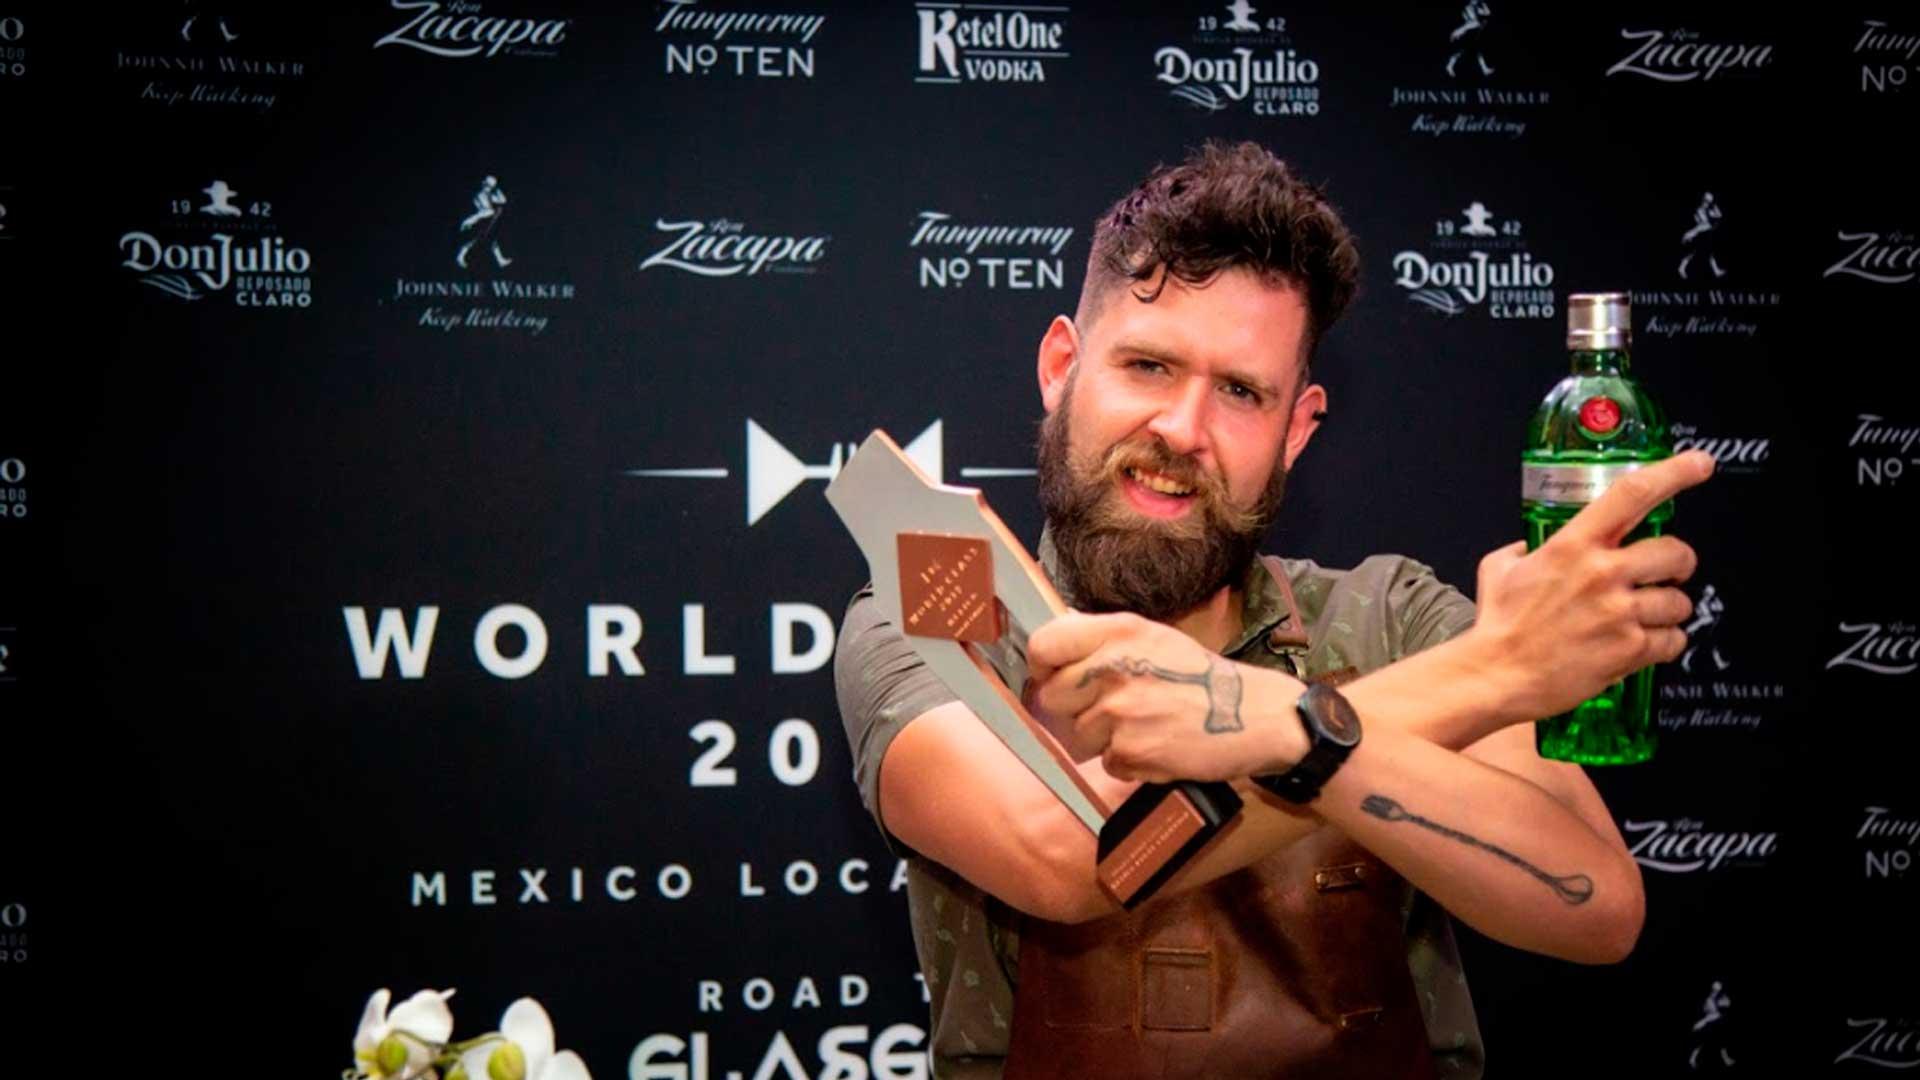 Rodrigo Vidales del bar Blacksmith es el ganador de World Class México